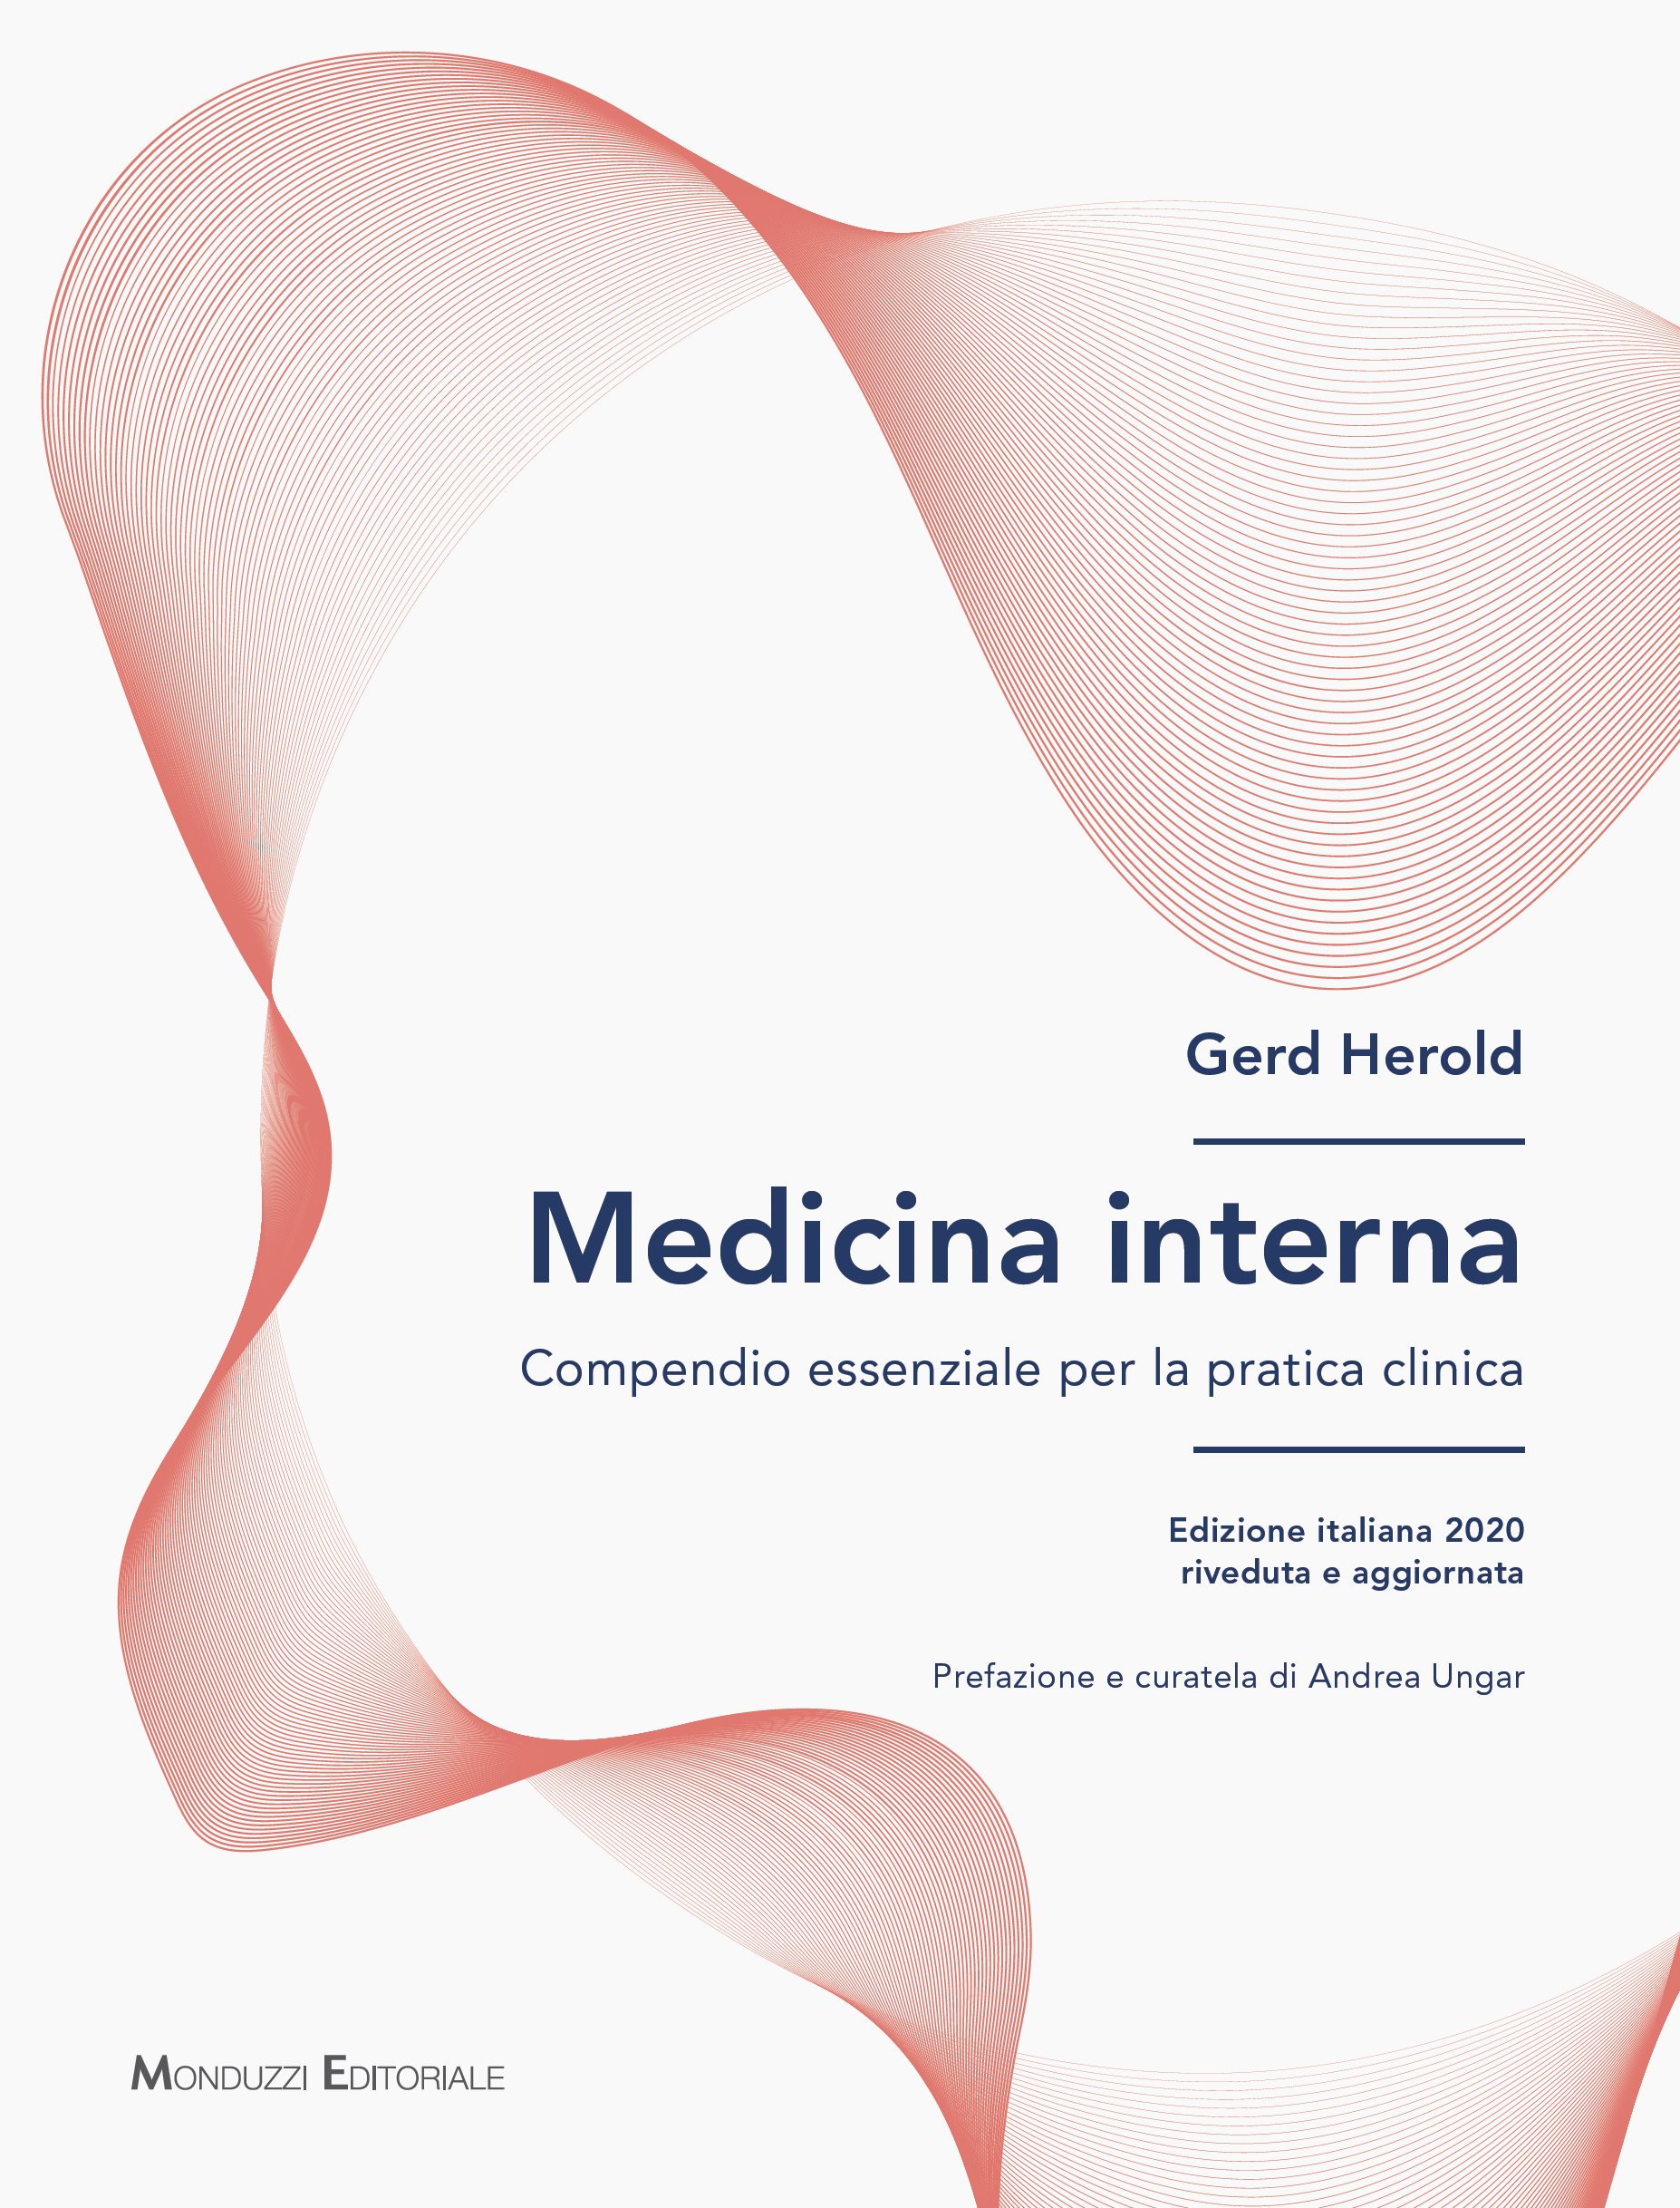 copertina-medicina-interna-gerd-herold-2020